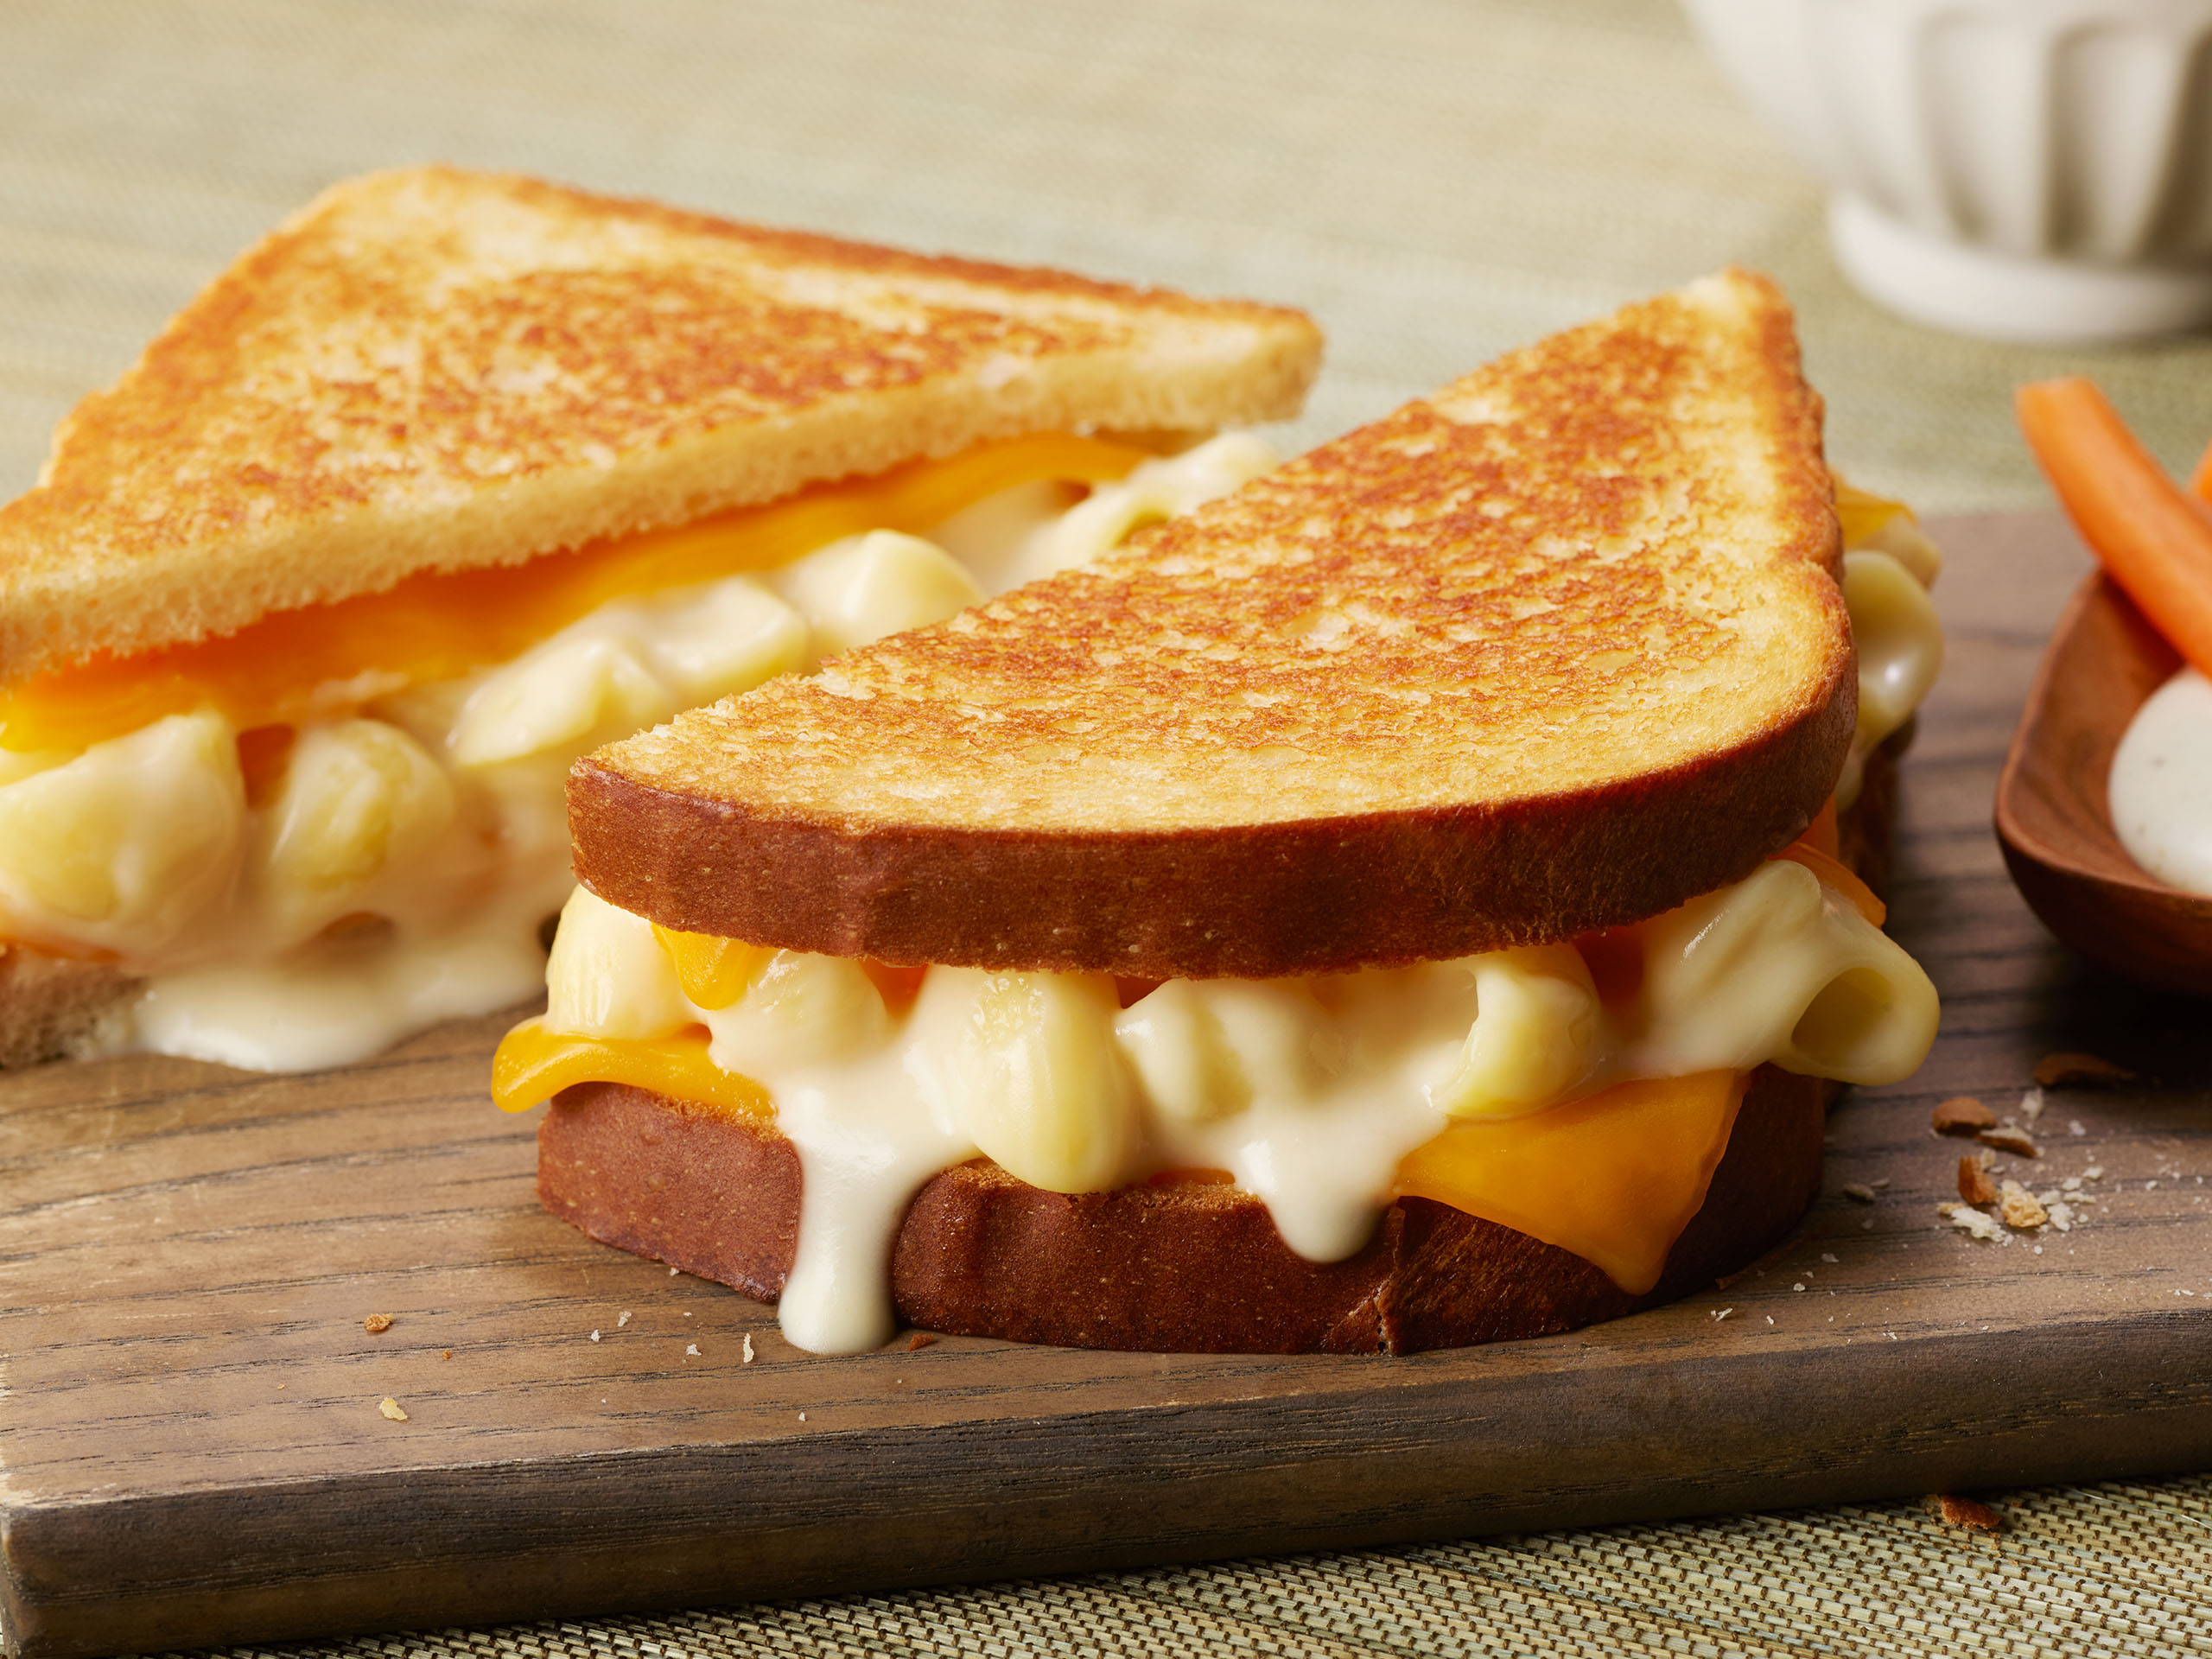 Mac Cheese Grilled Cheese Panera At Home